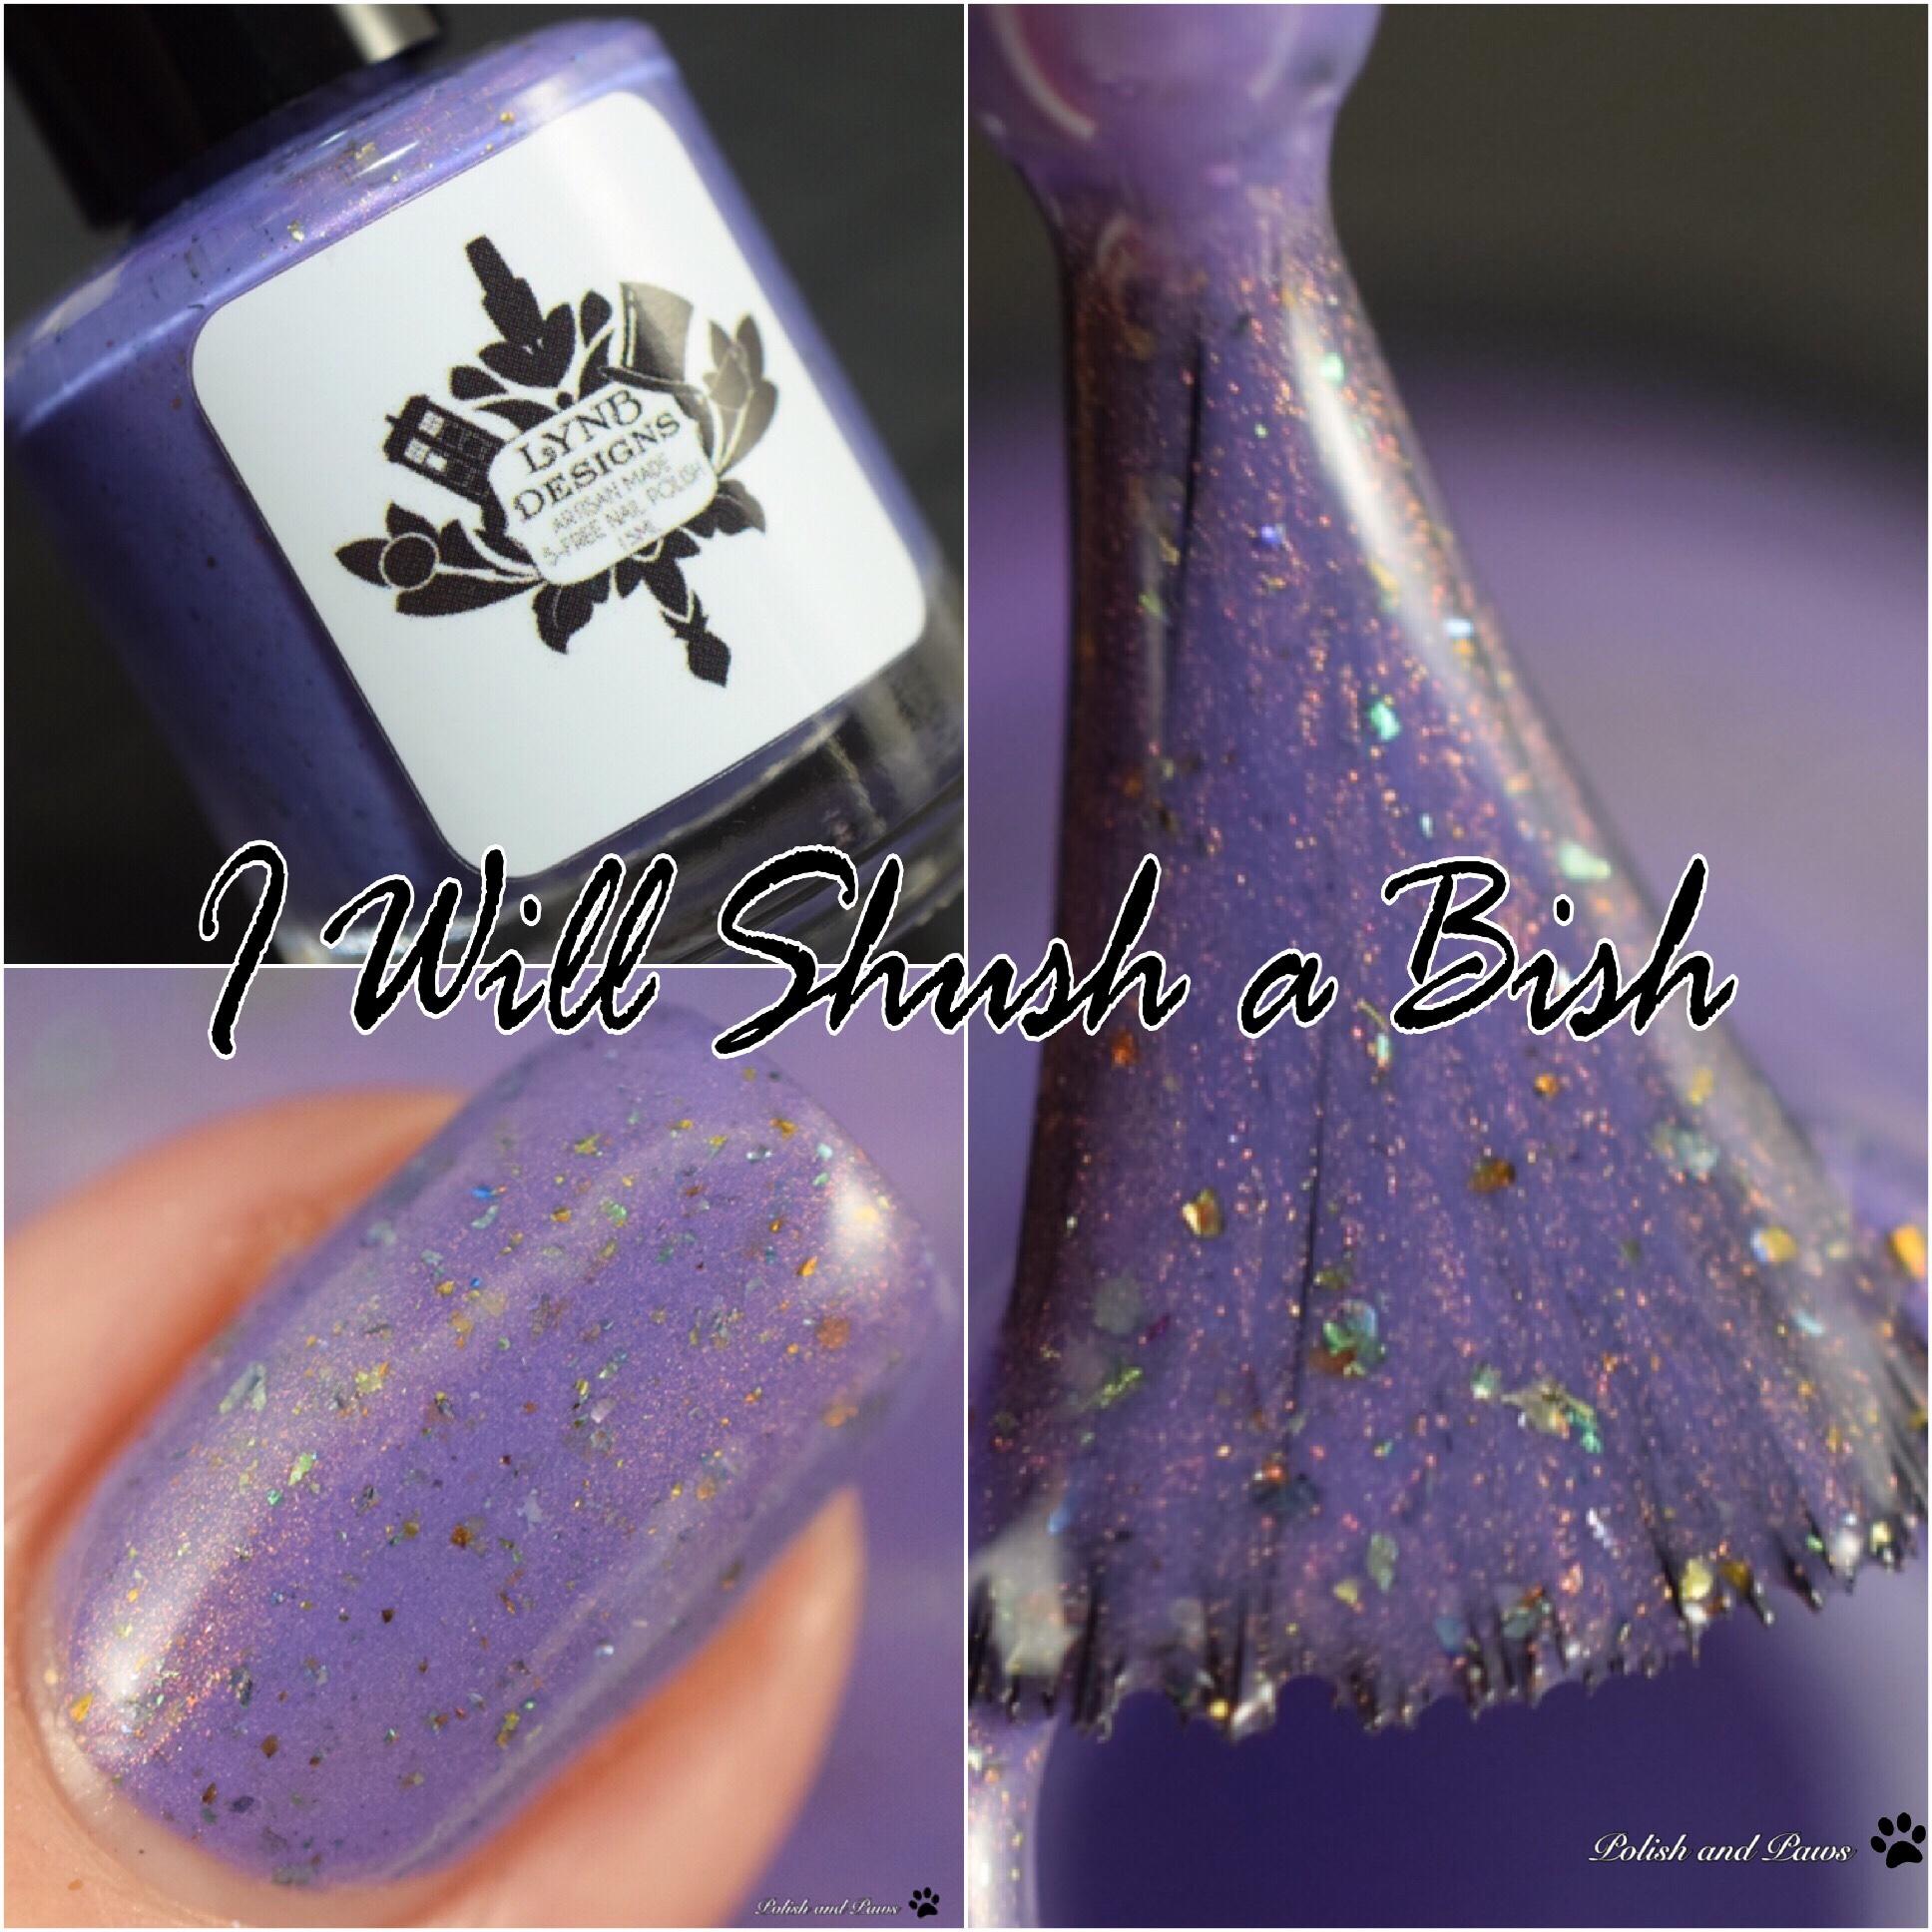 LynB Designs I Will Shush a Bish